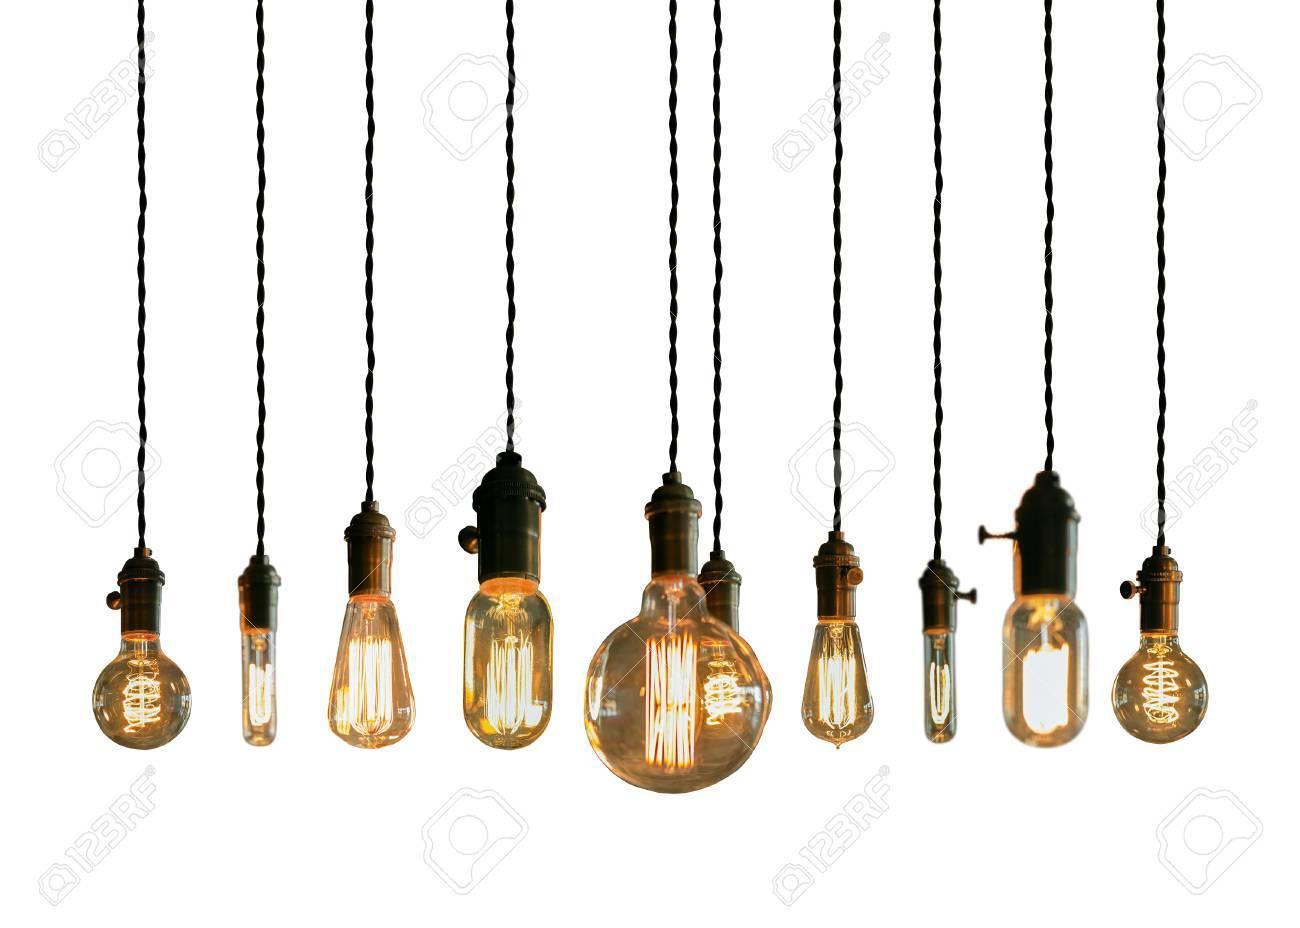 Decorative antique edison style filament light bulbs Stock Photo - 42522702